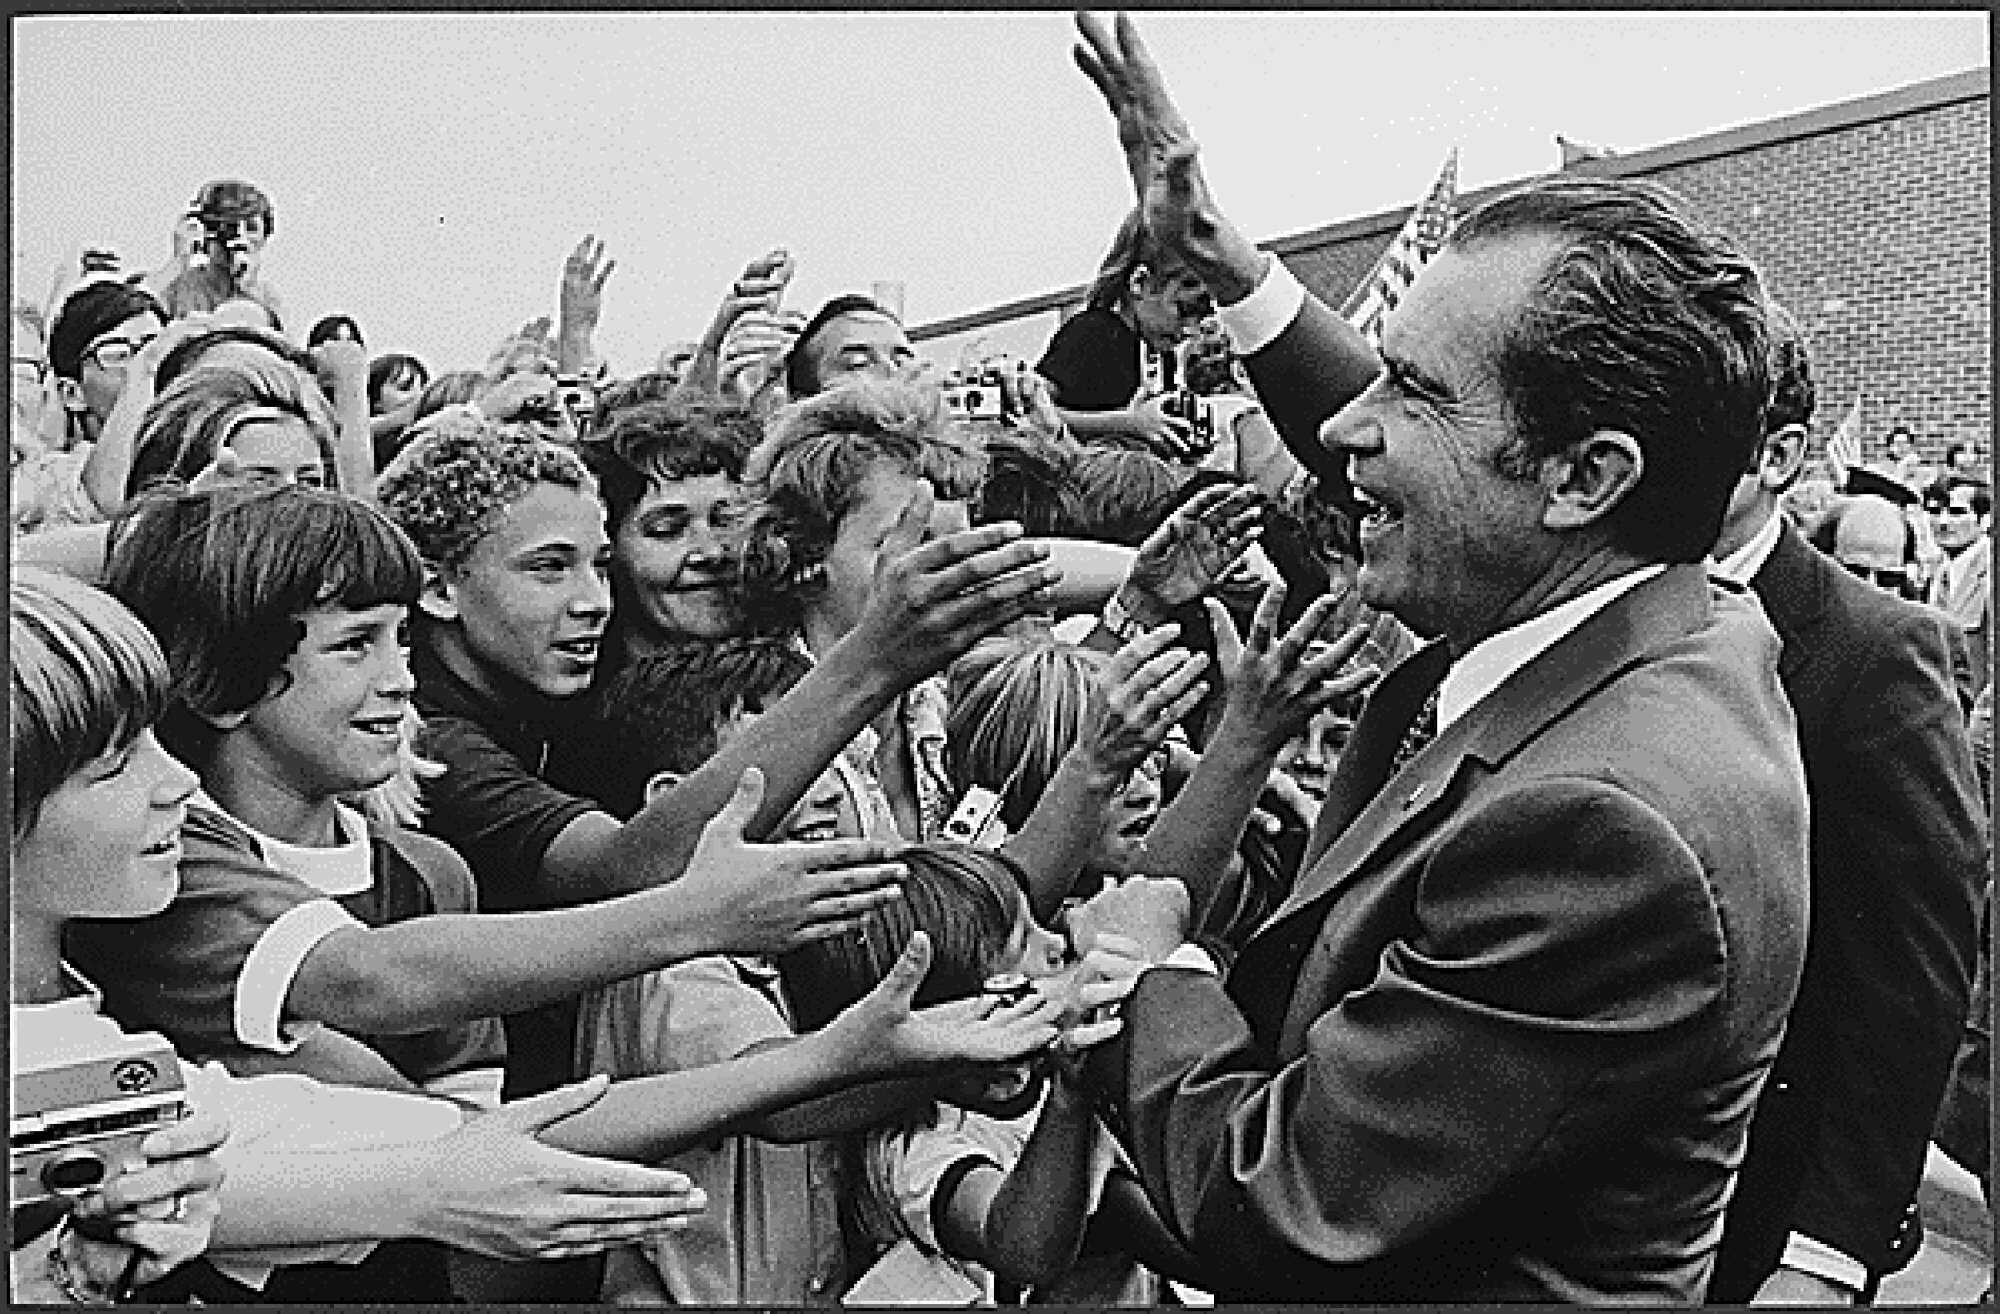 Eisenhower-Richard_Nixon_greeted_by_children_during_campaign_1972.jpg